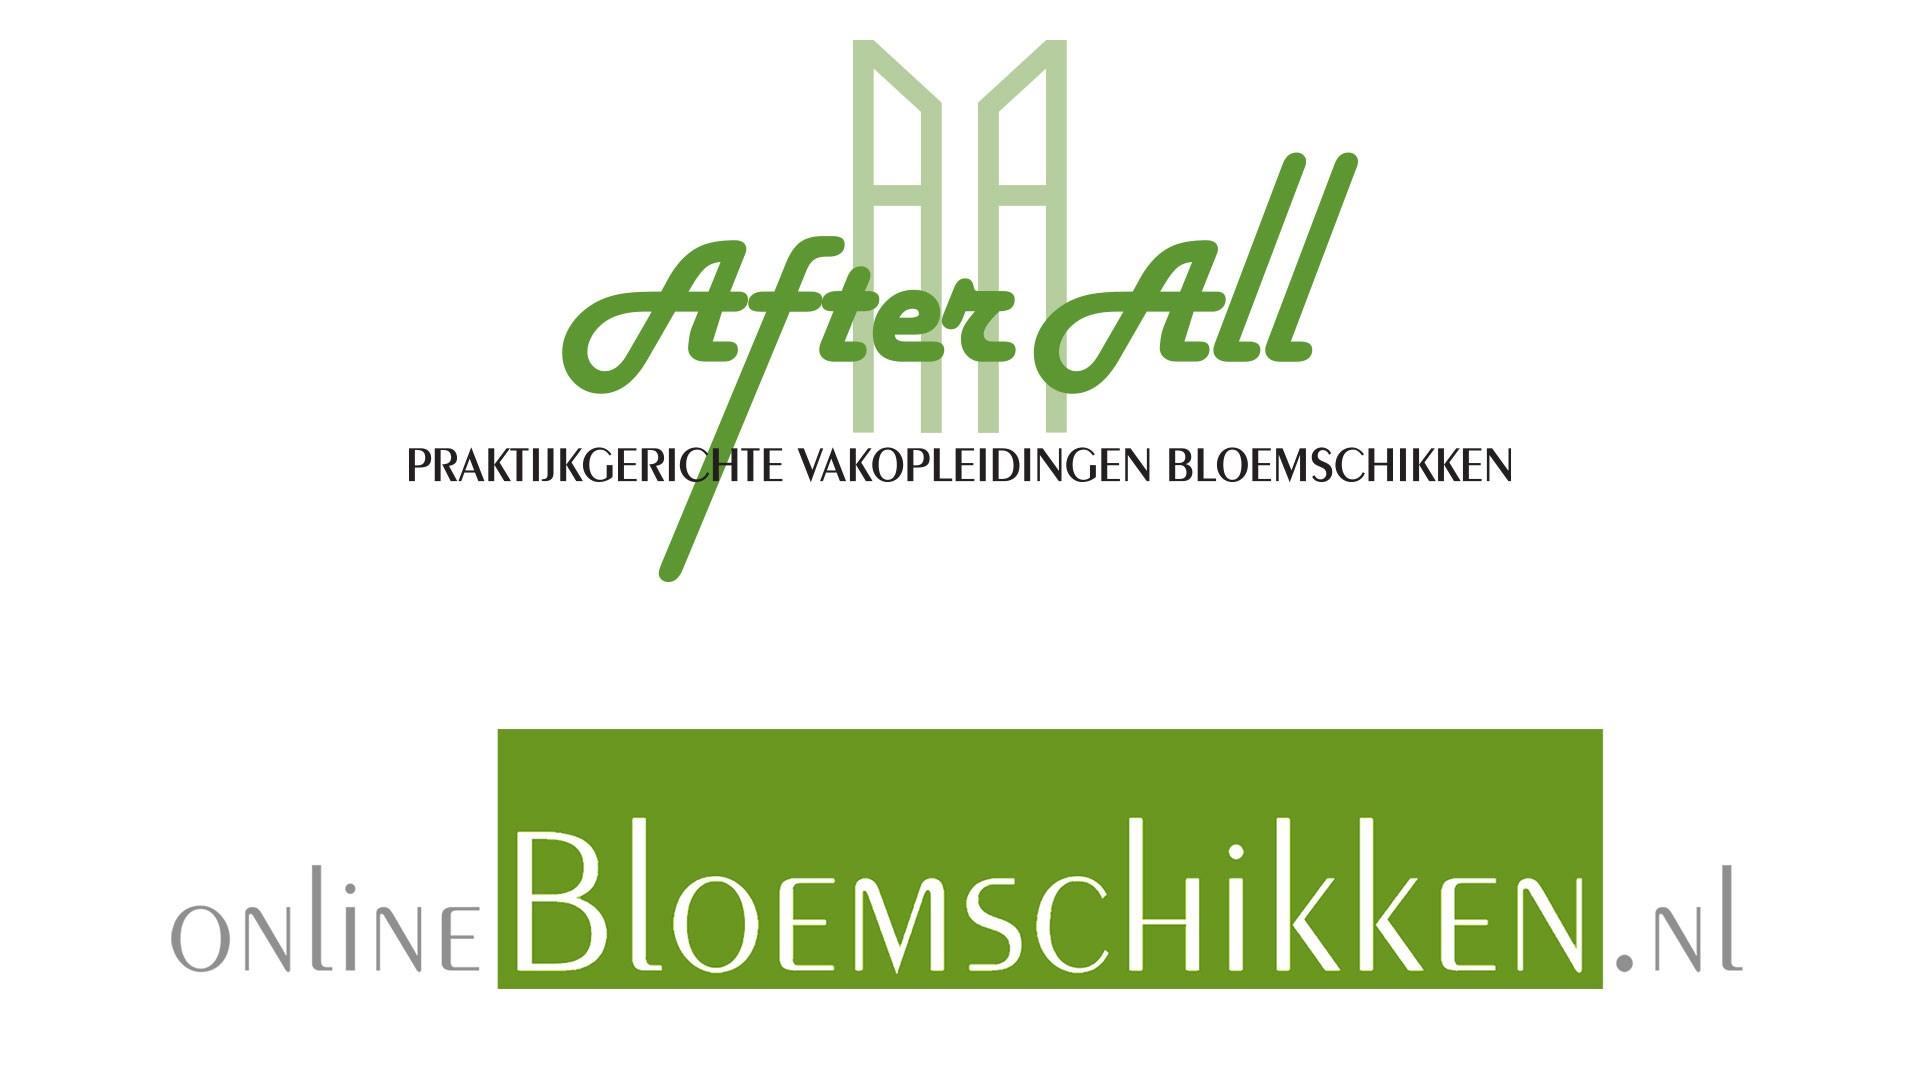 after all en onlineBloemschikken.nl